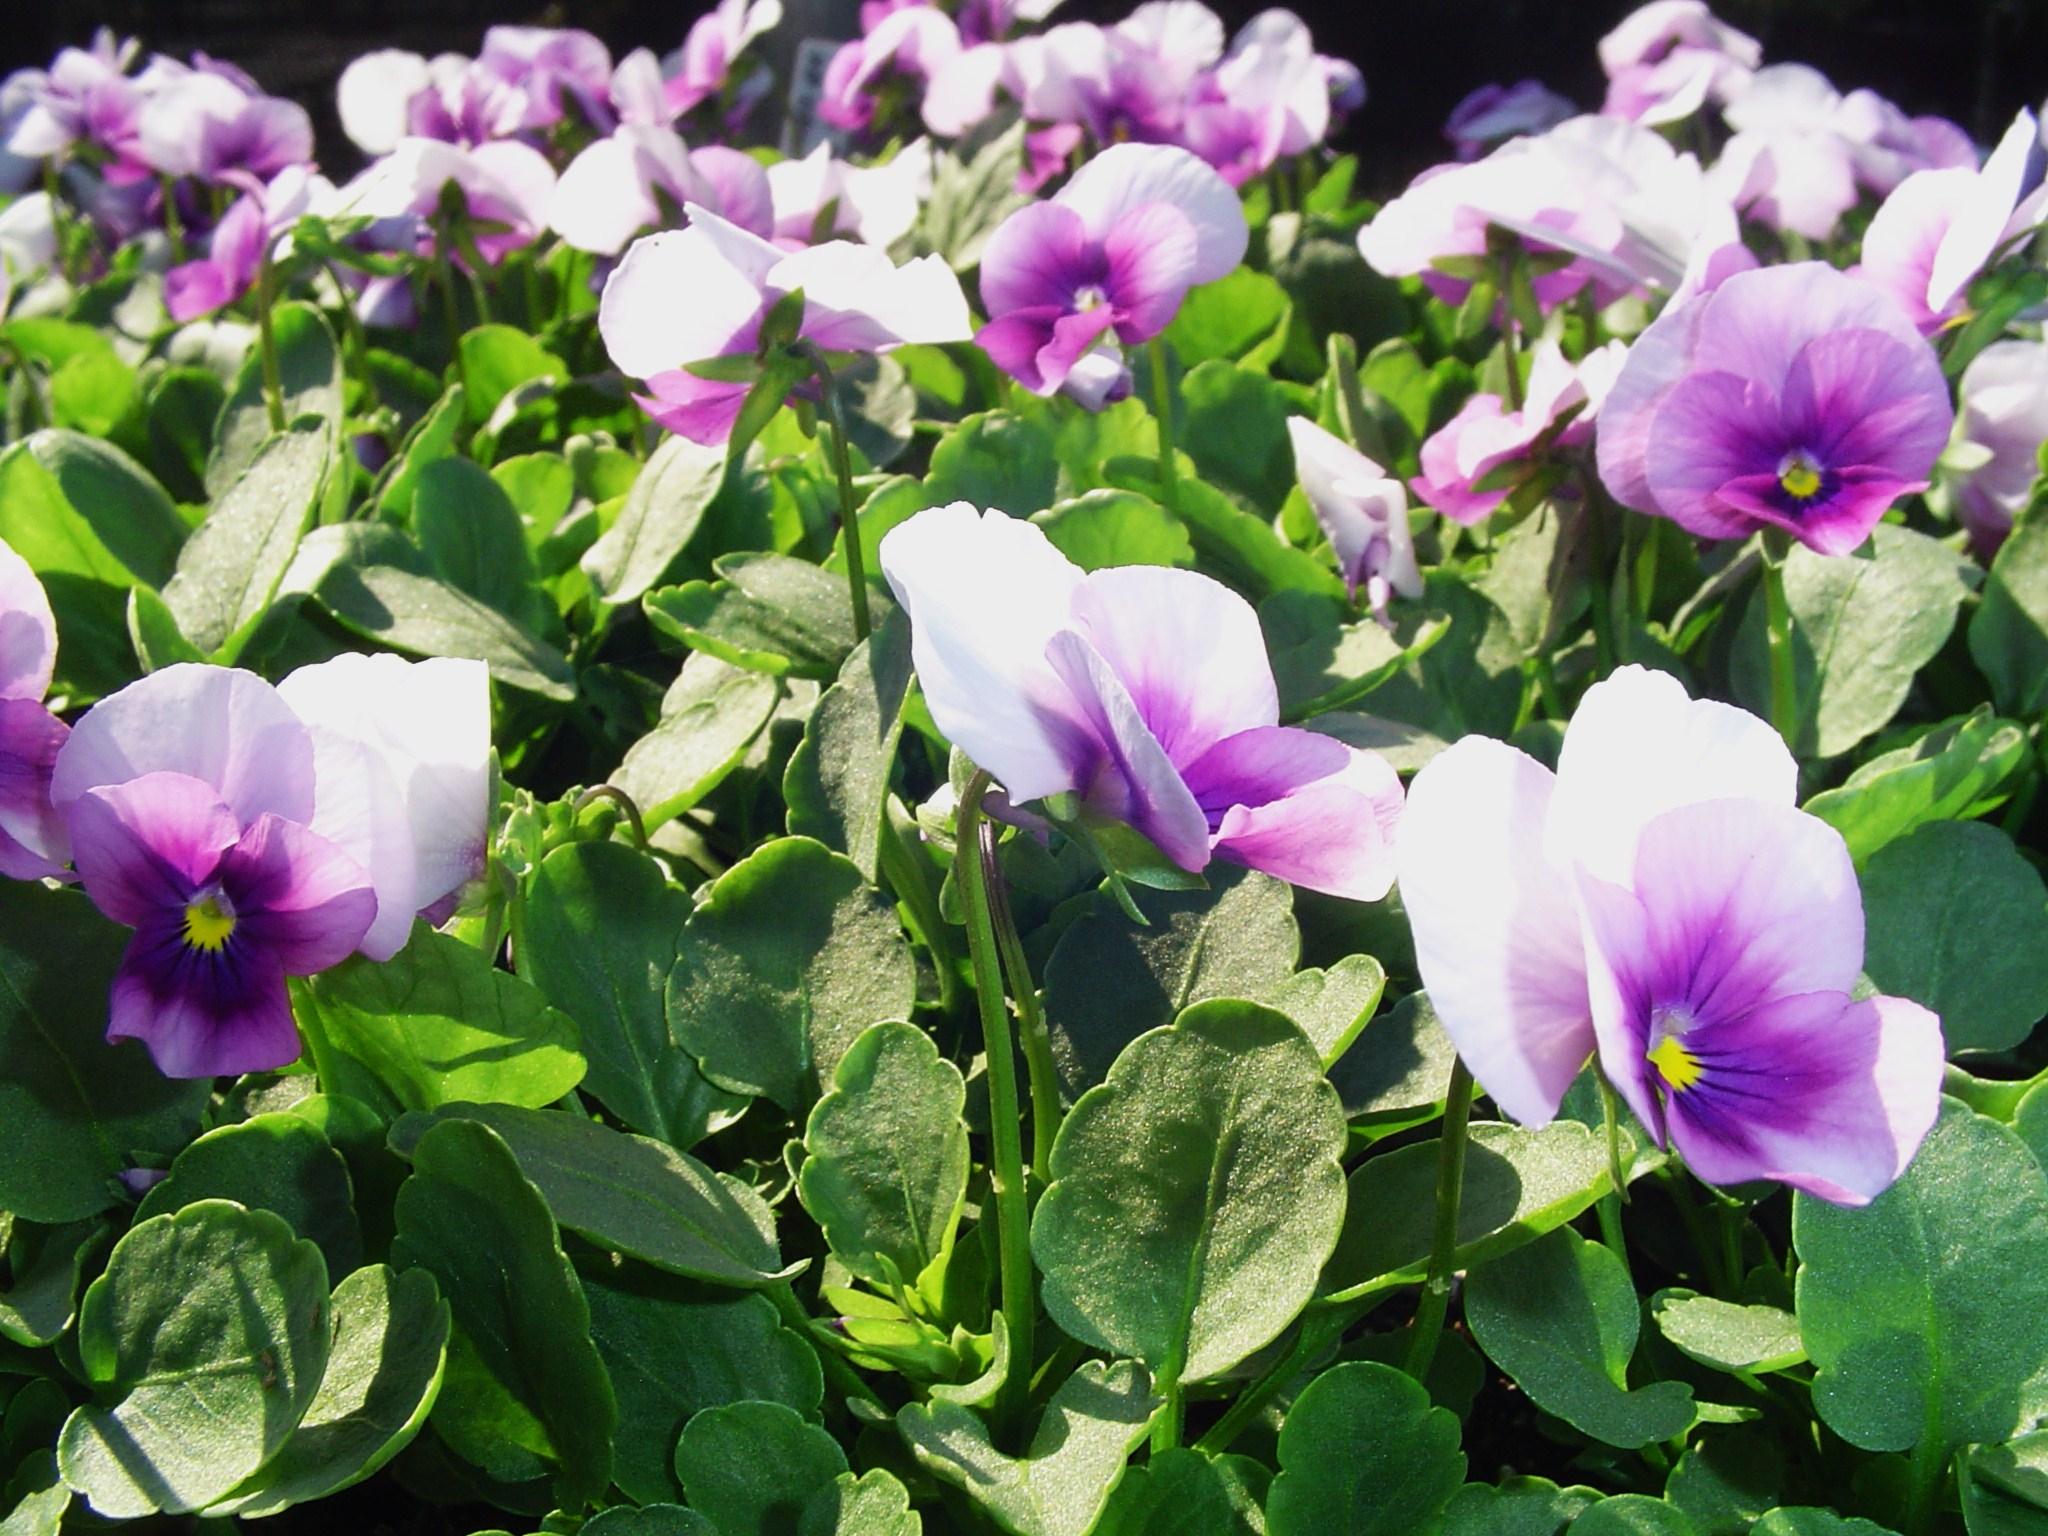 Violas for winter blooms forest garden violas for winter blooms october 4 shopping 016 izmirmasajfo